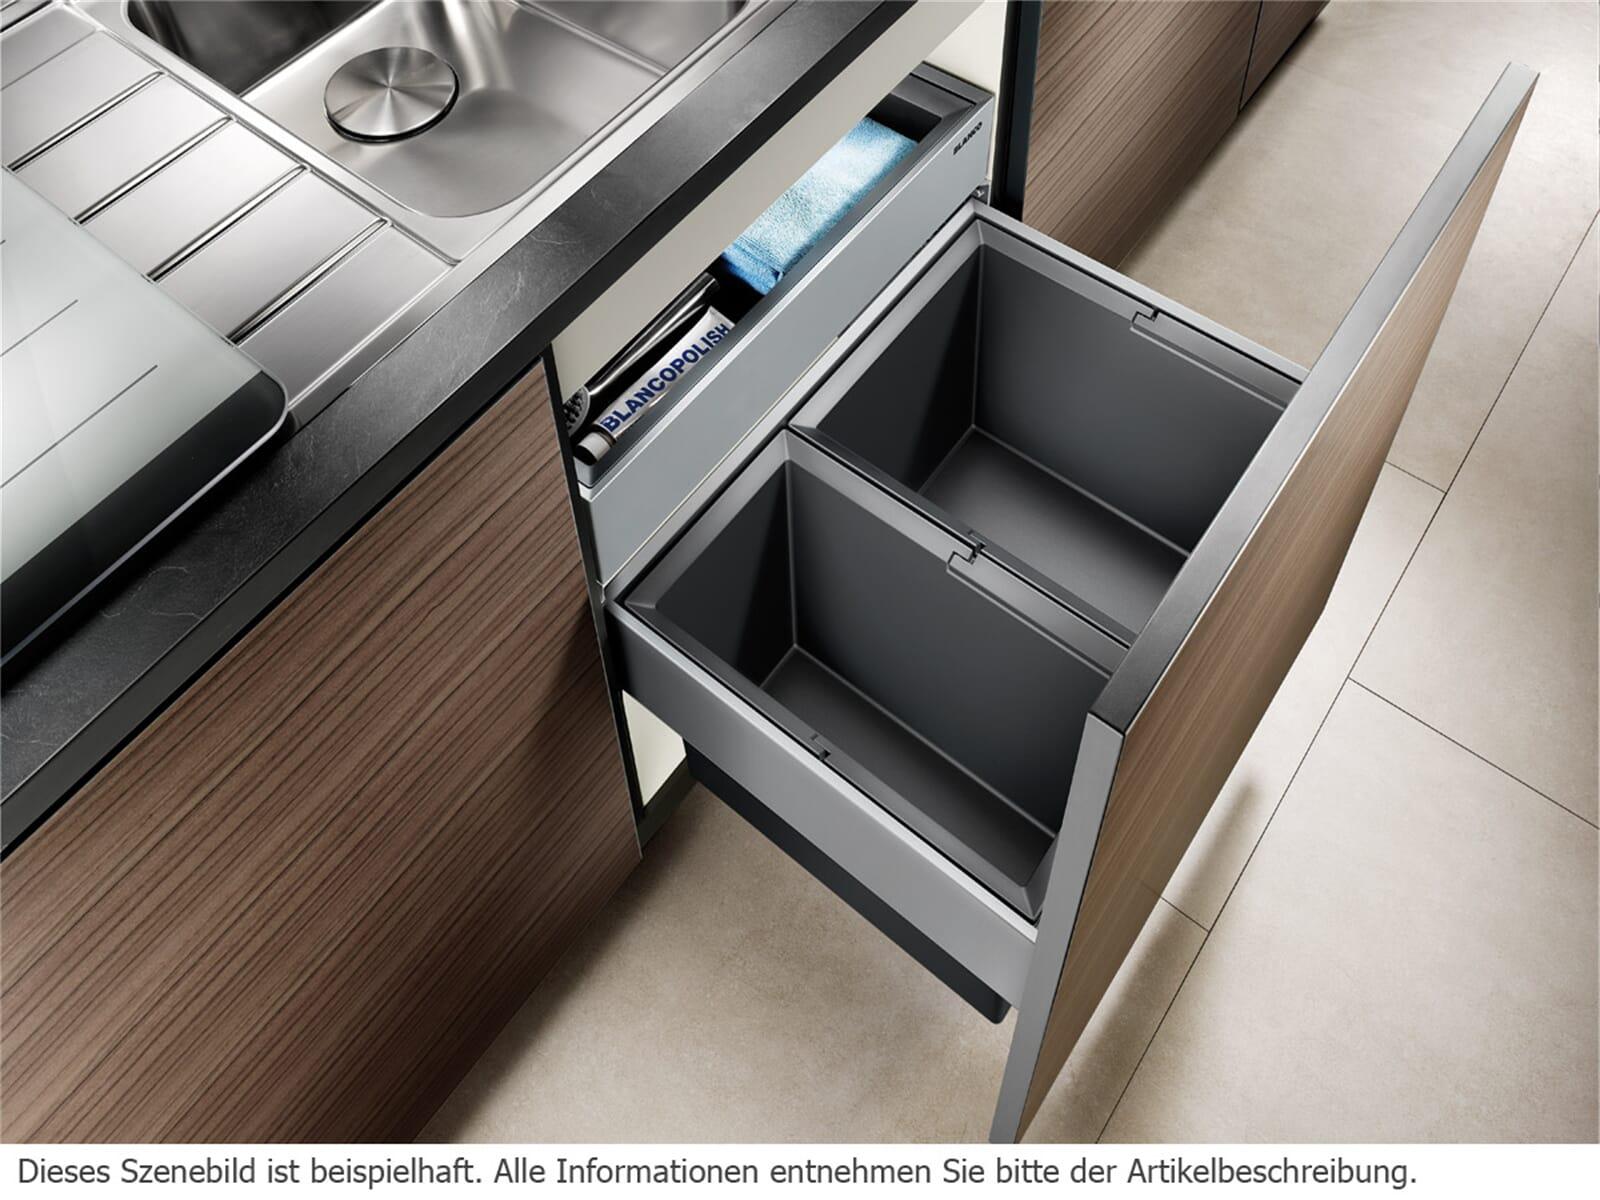 blanco select 60 2 orga einbau abfallsammler f r 178 90 eur. Black Bedroom Furniture Sets. Home Design Ideas